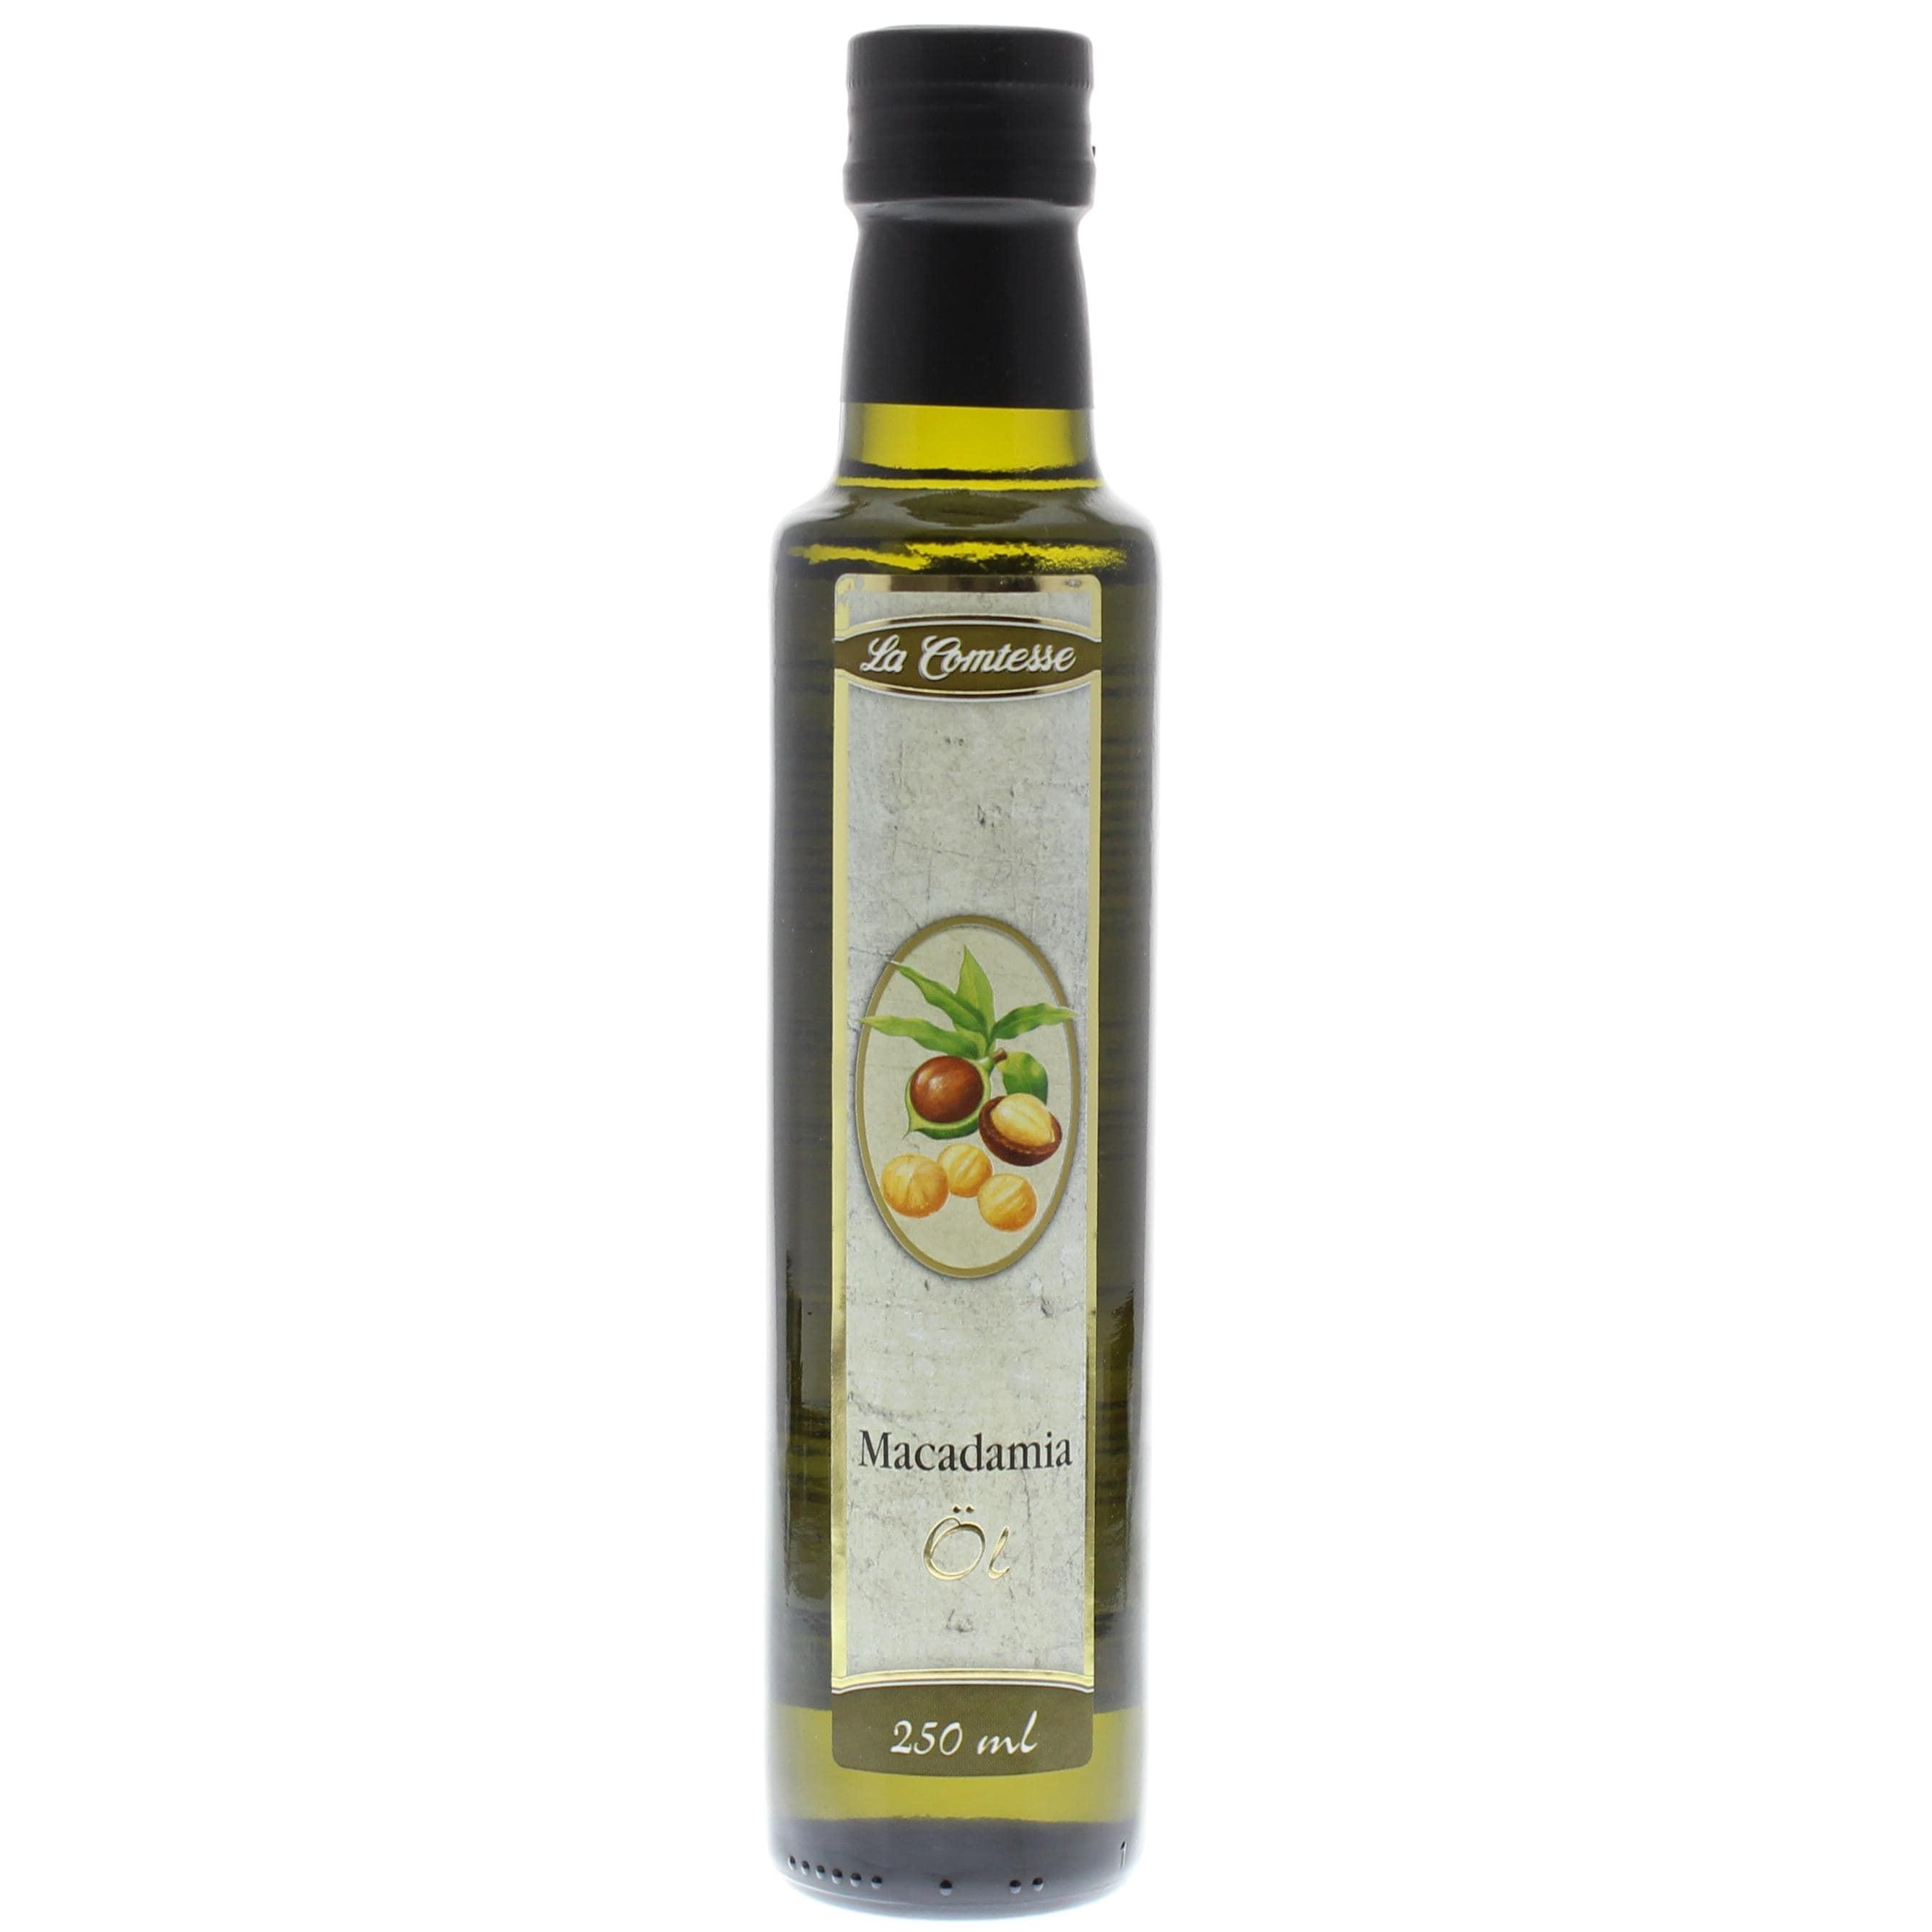 La Comtesse - Macadamia Öl - 250ml